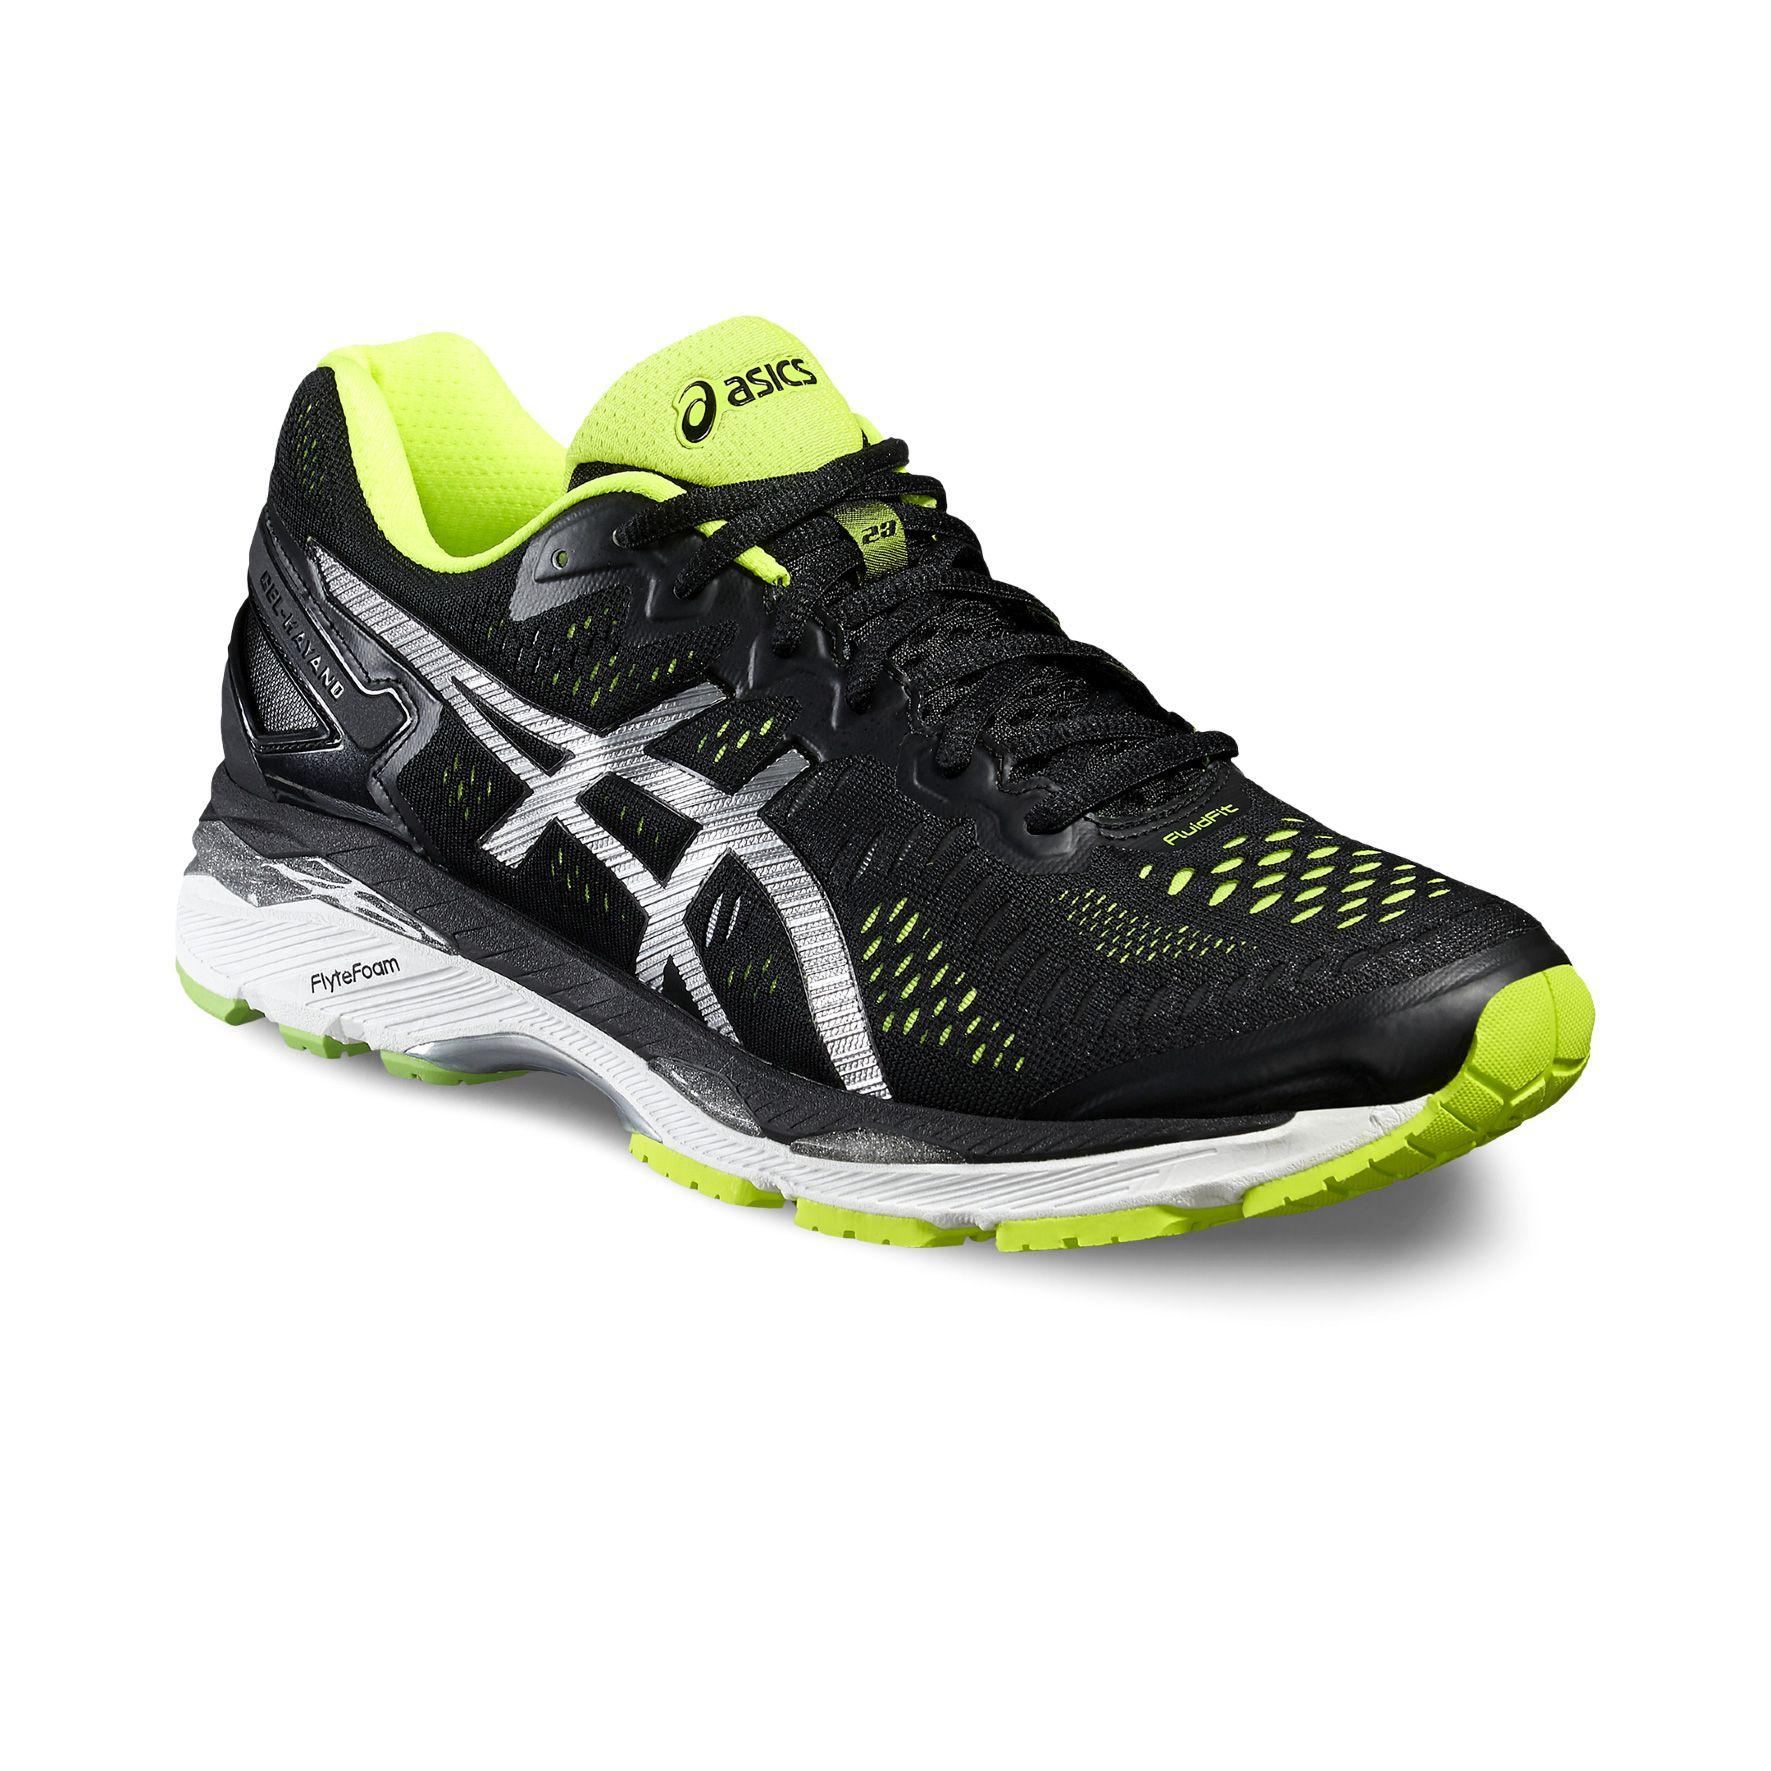 asics gel kayano 23 mens running shoes aw16. Black Bedroom Furniture Sets. Home Design Ideas